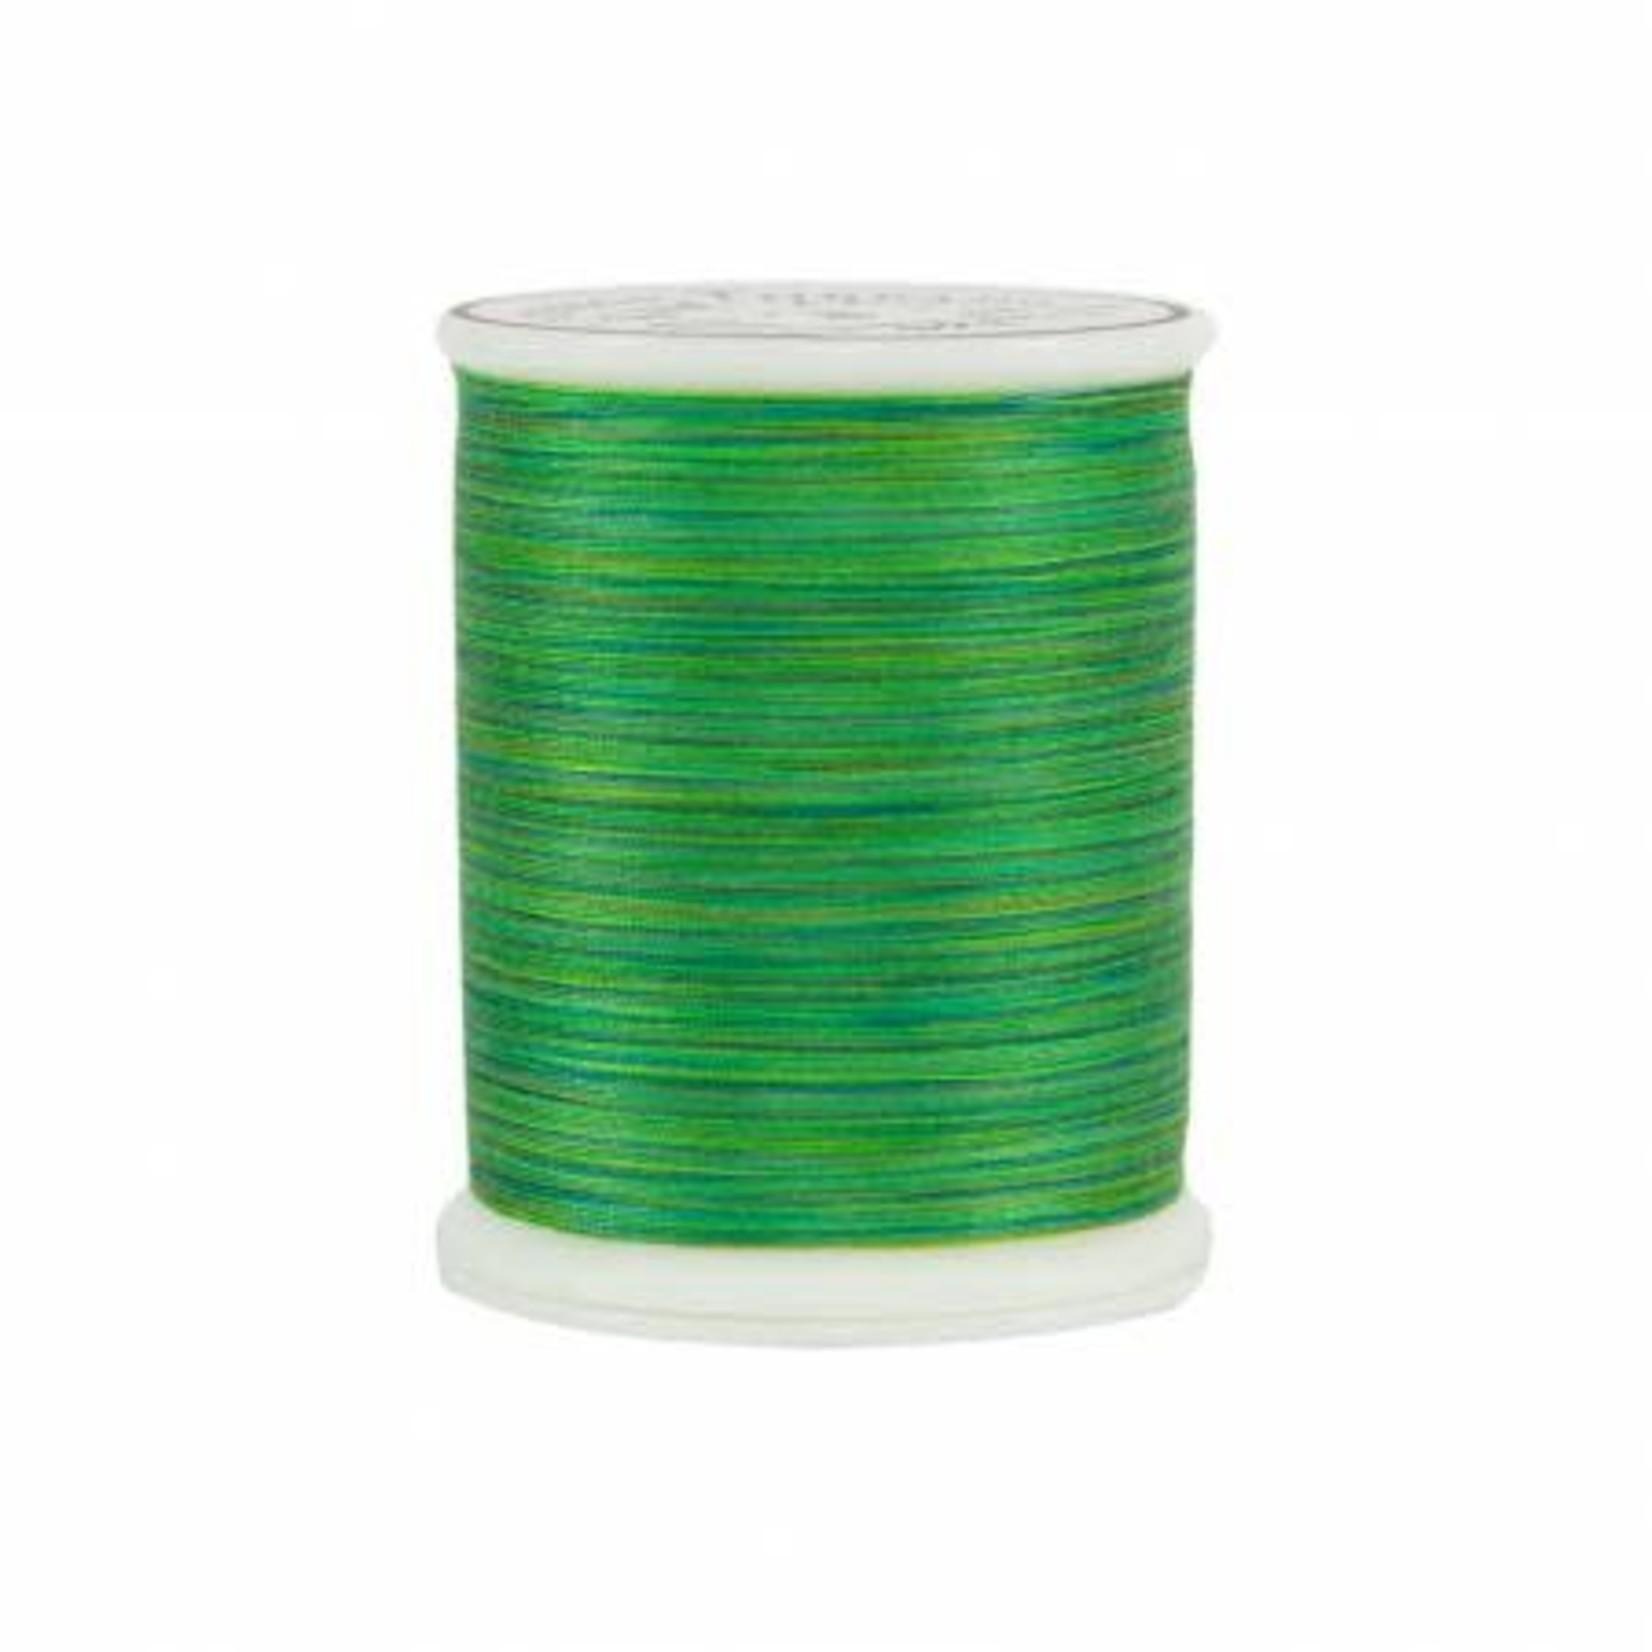 Superior Threads King Tut - #40 - 457 m - 0923 Fahl Green